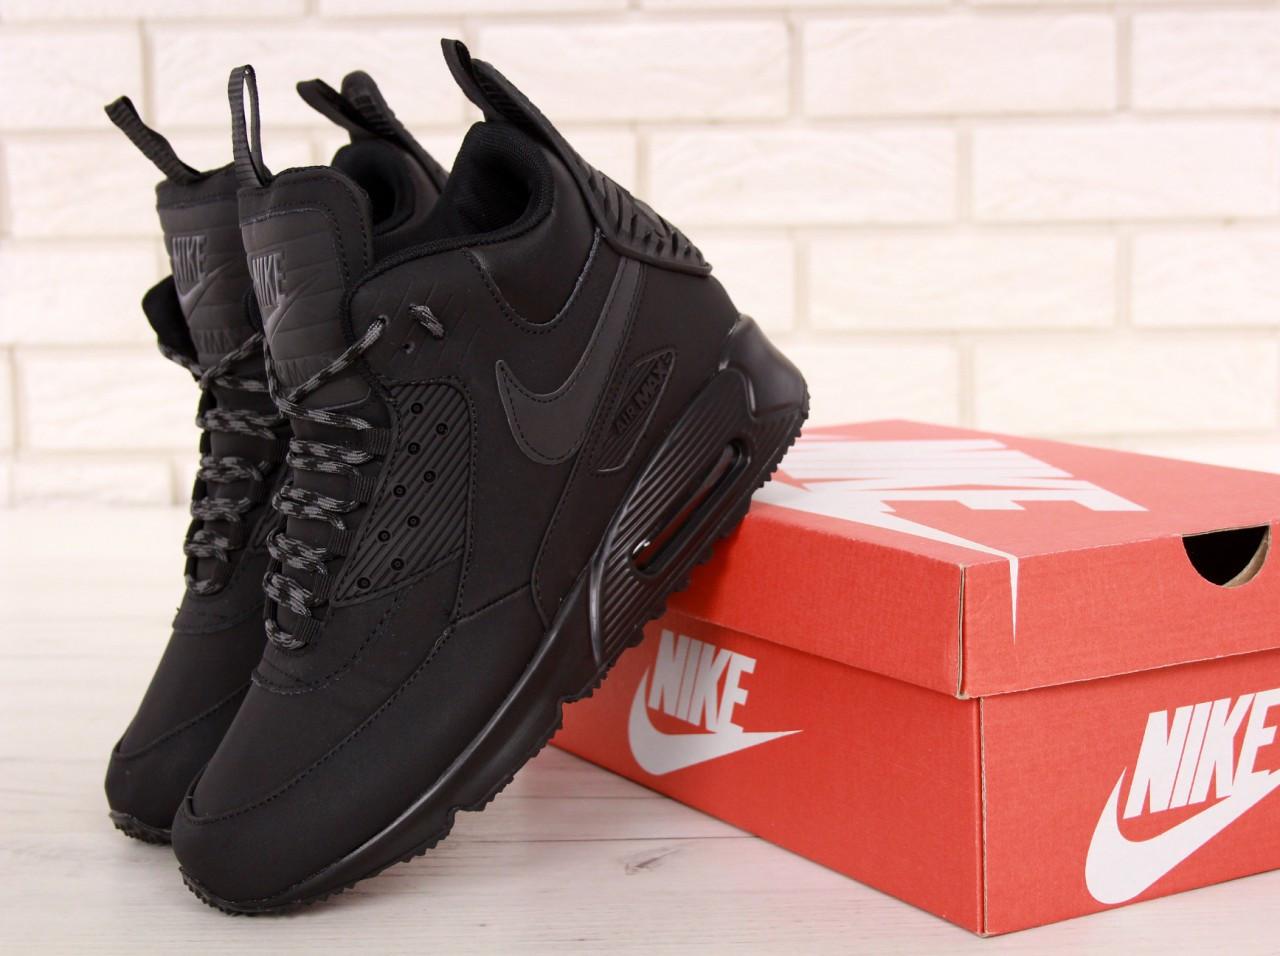 39bbcadc Мужские зимние кроссовки Nike Air Max 90 Sneakerboot Winter Black - Магазин  одежды и обуви welldone